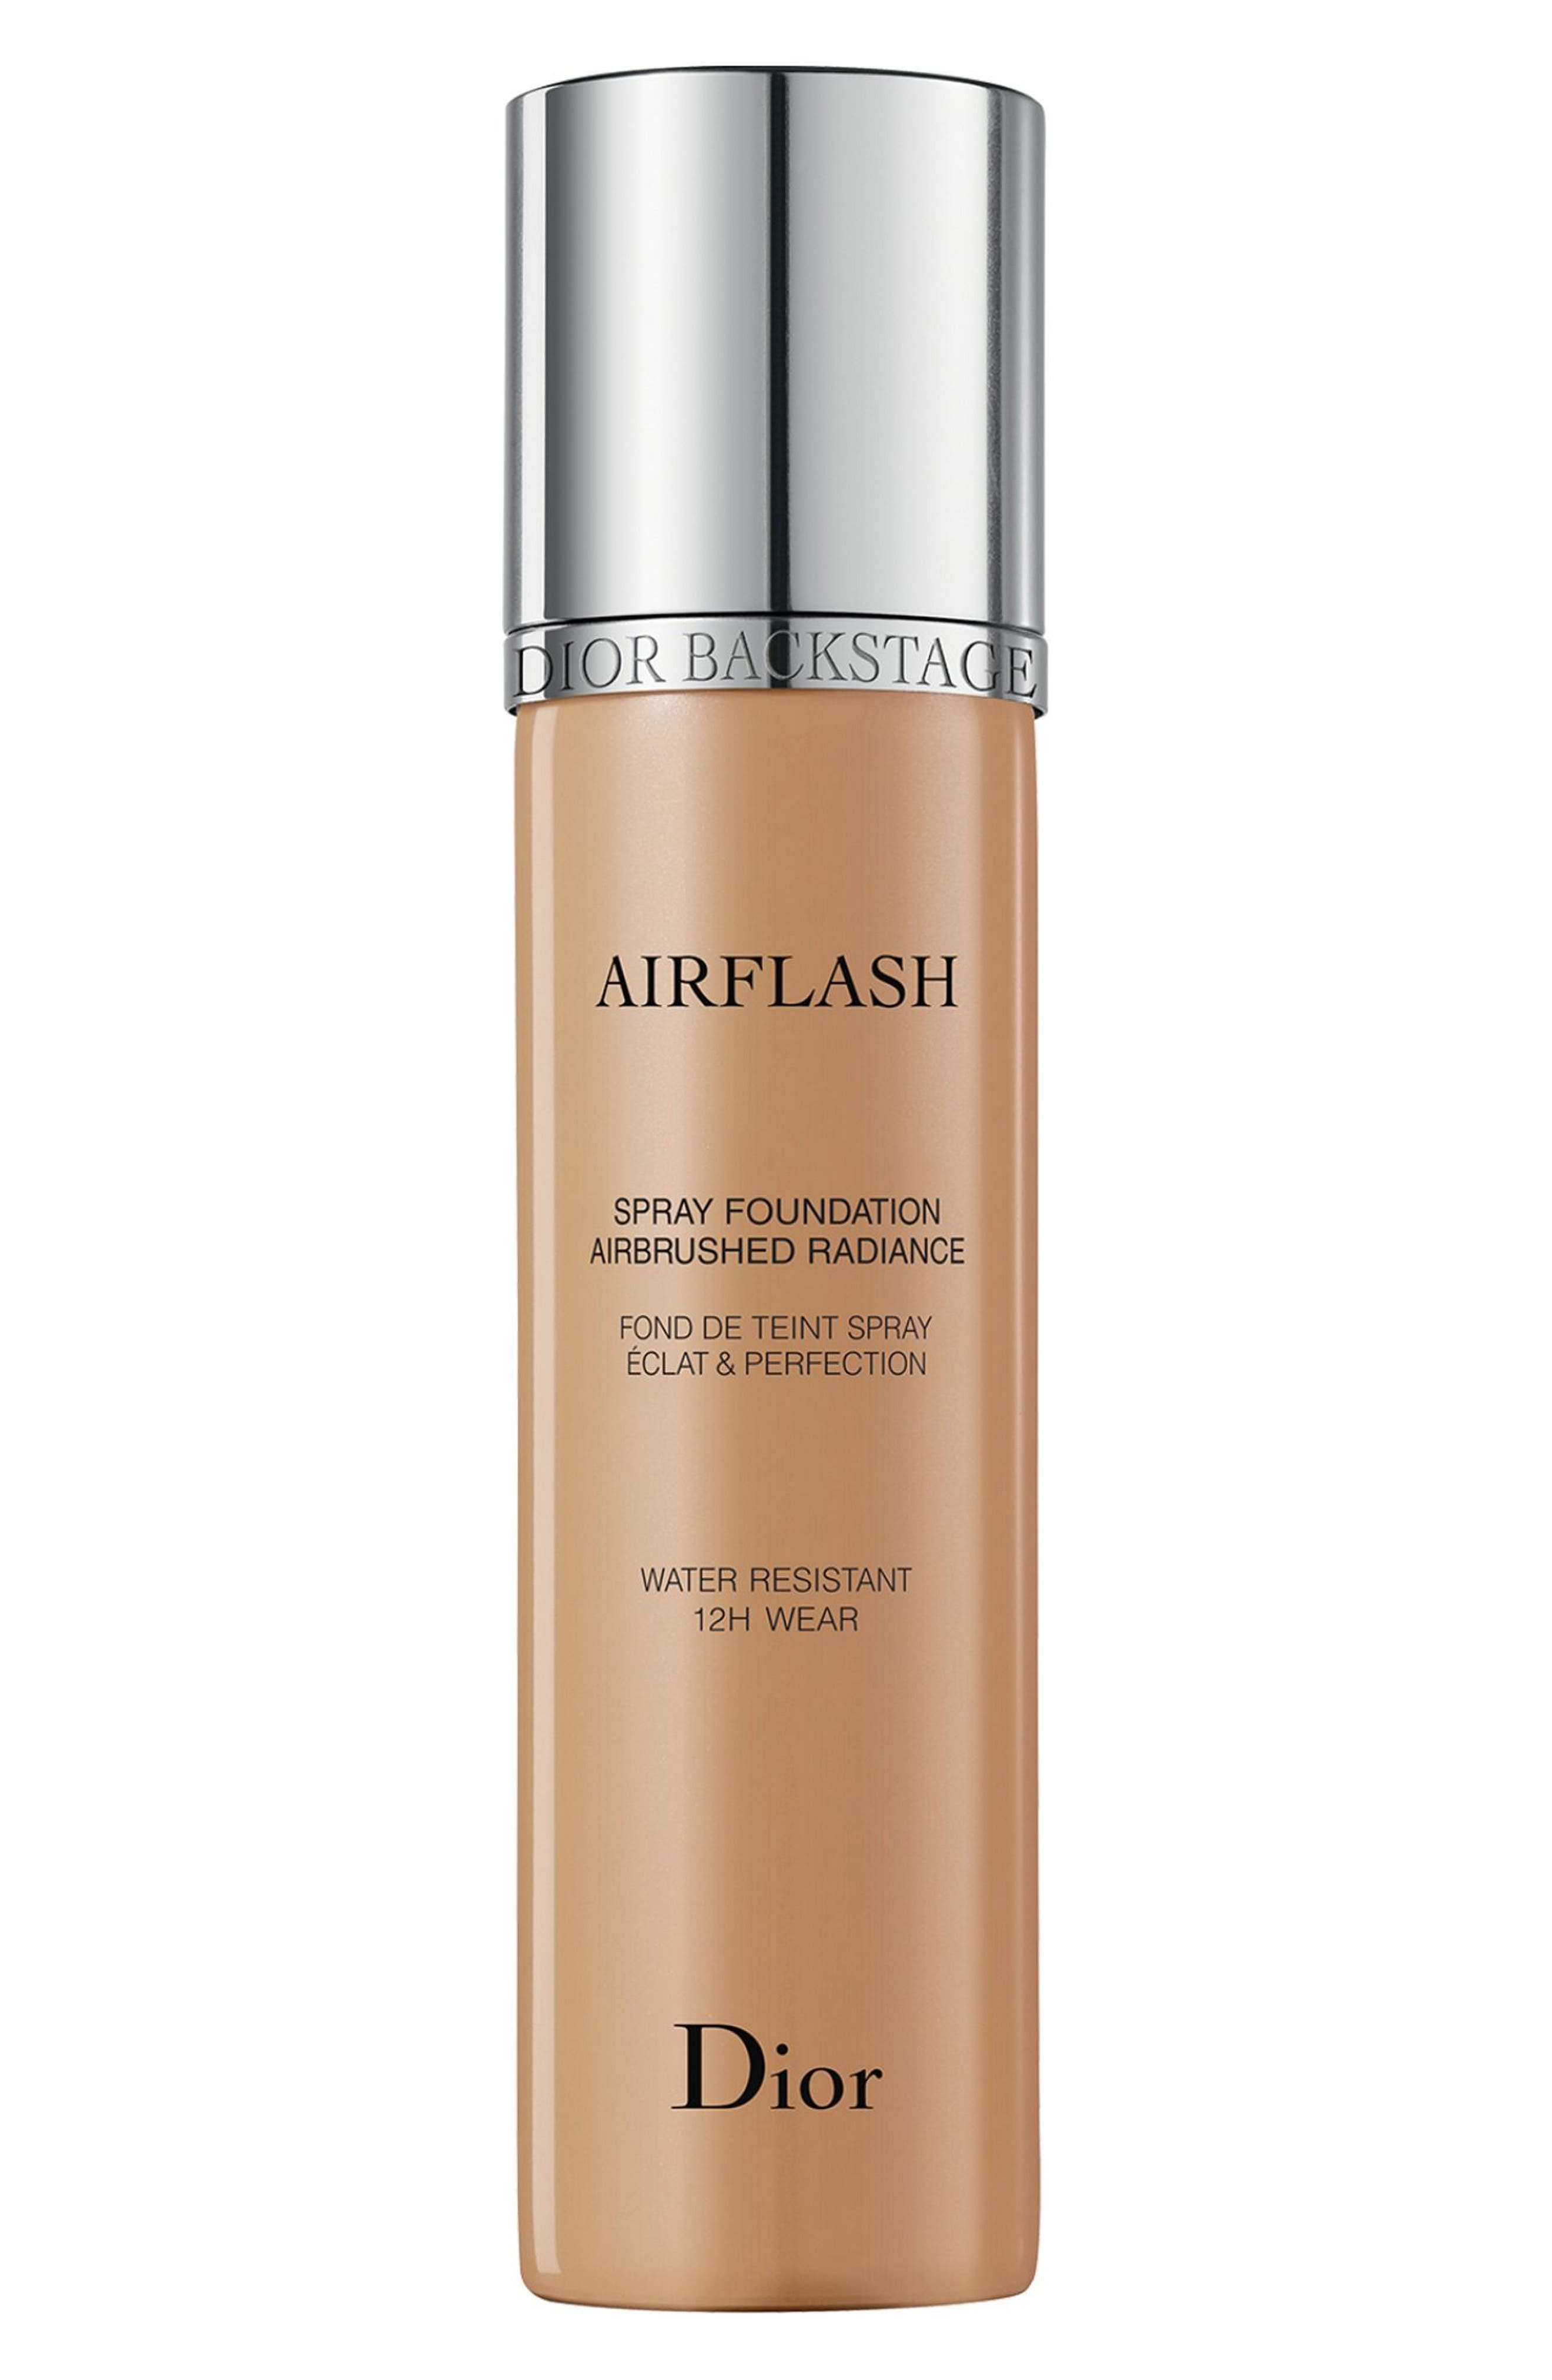 Diorskin Airflash Spray Foundation,                             Main thumbnail 1, color,                             401 OCHRE